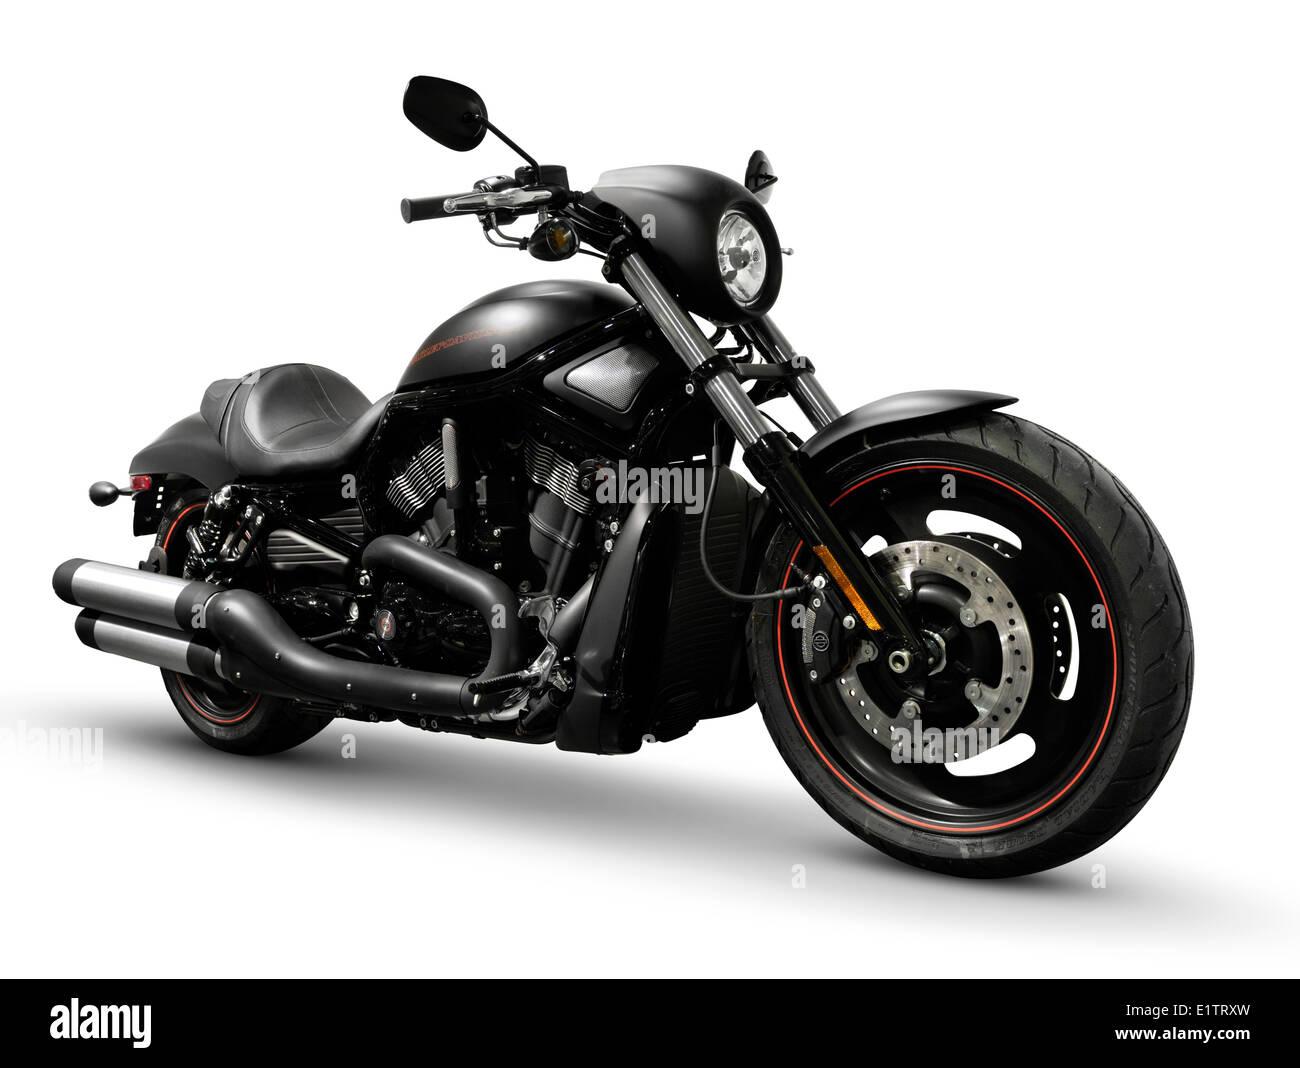 Black 2007 Harley Davidson VRSCD Night Rod Special motorcycle Isolated on white background - Stock Image